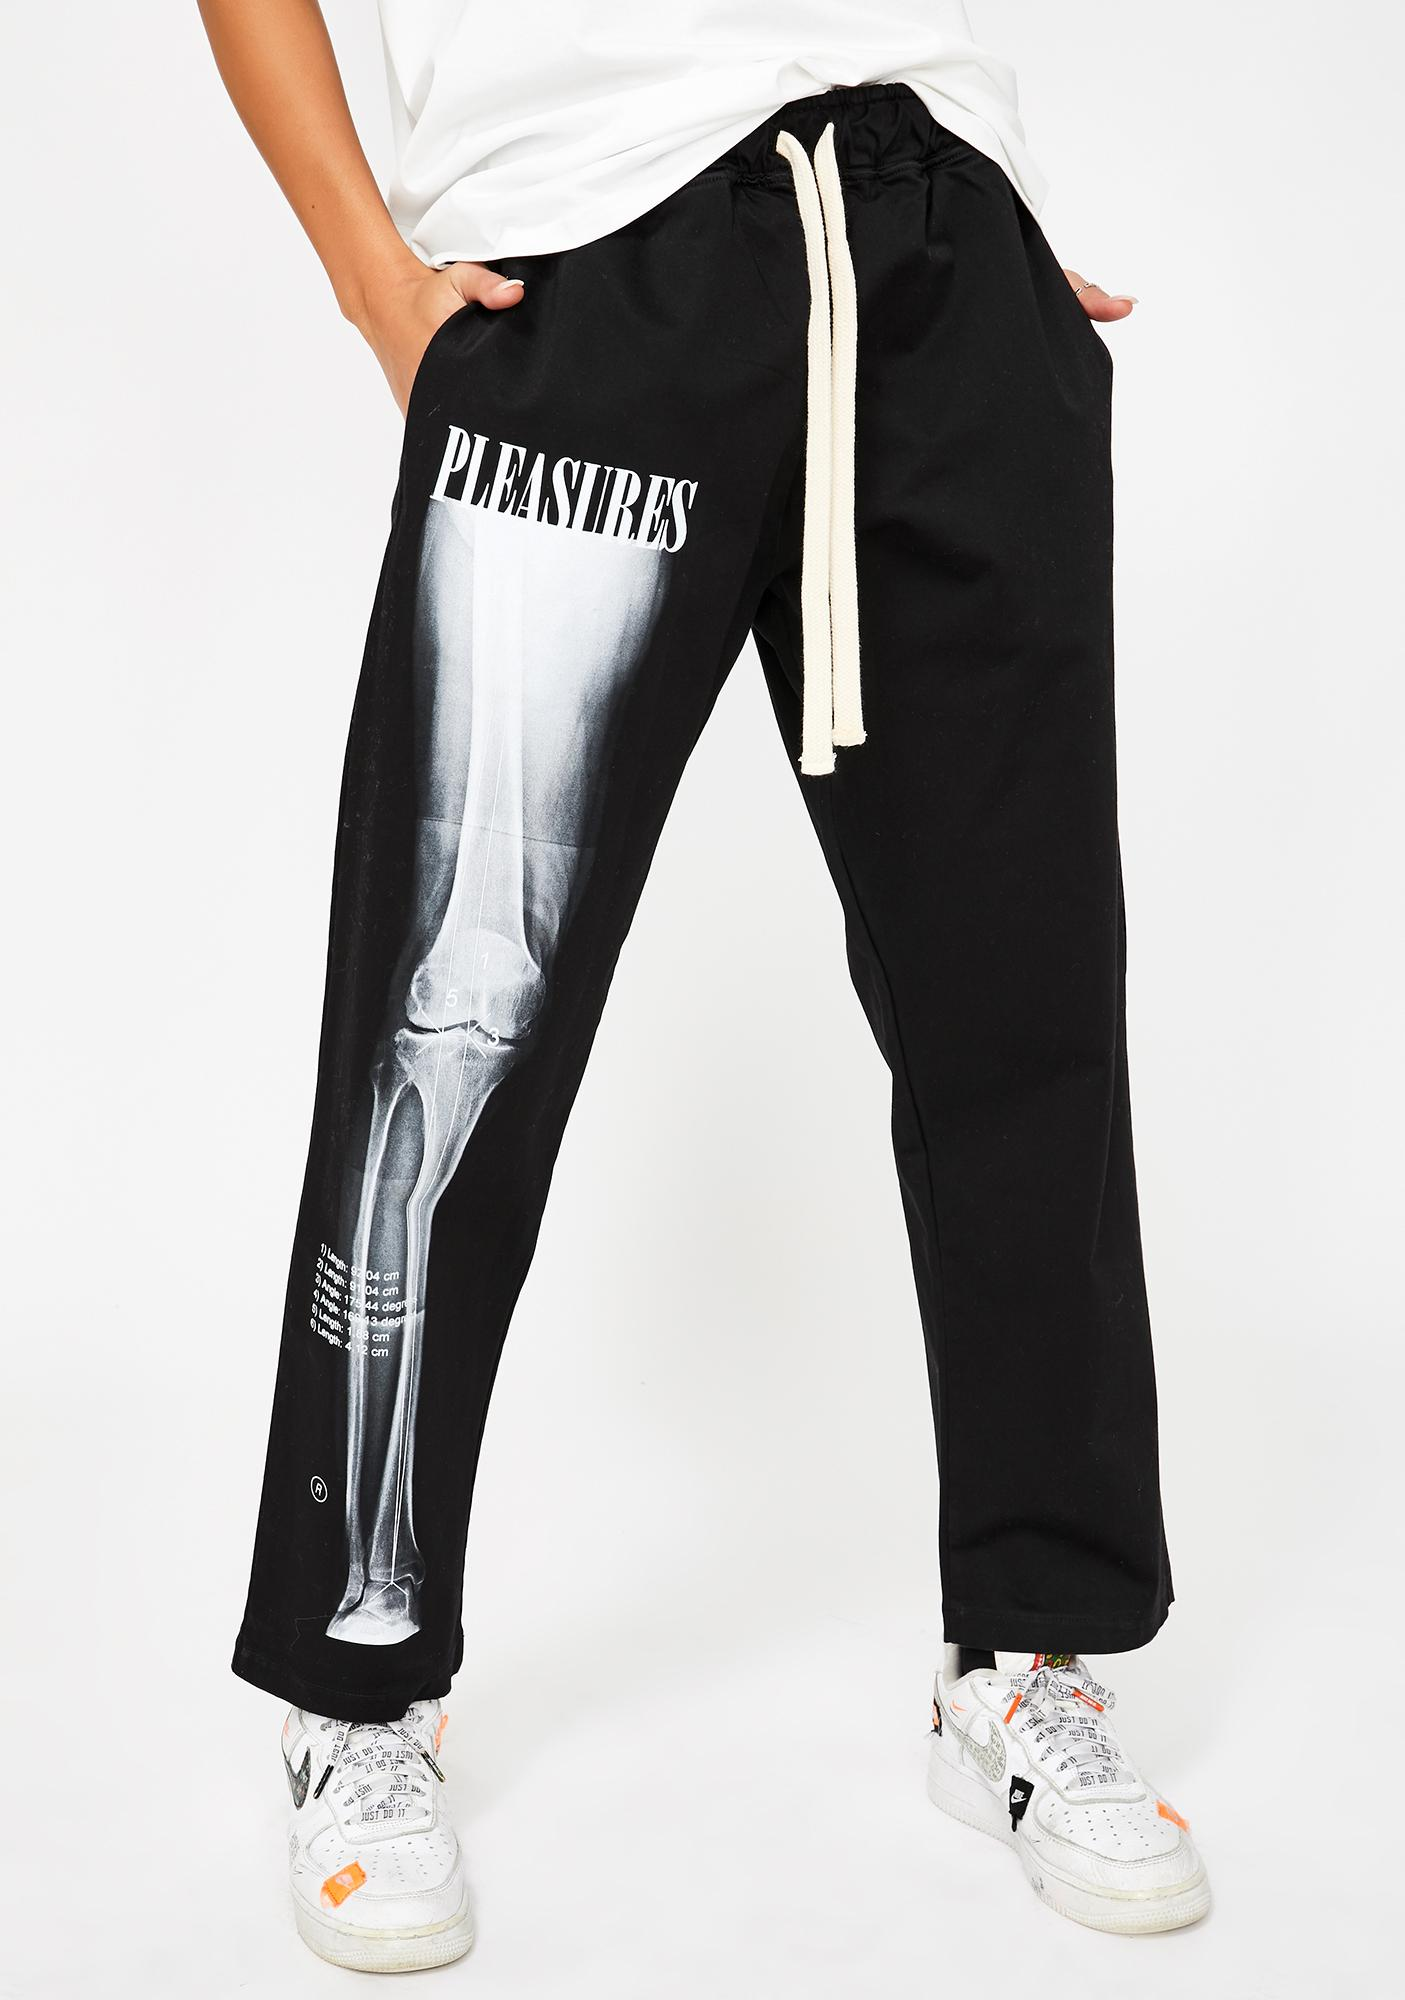 Pleasures Standard Issue X-Ray Beach Pants